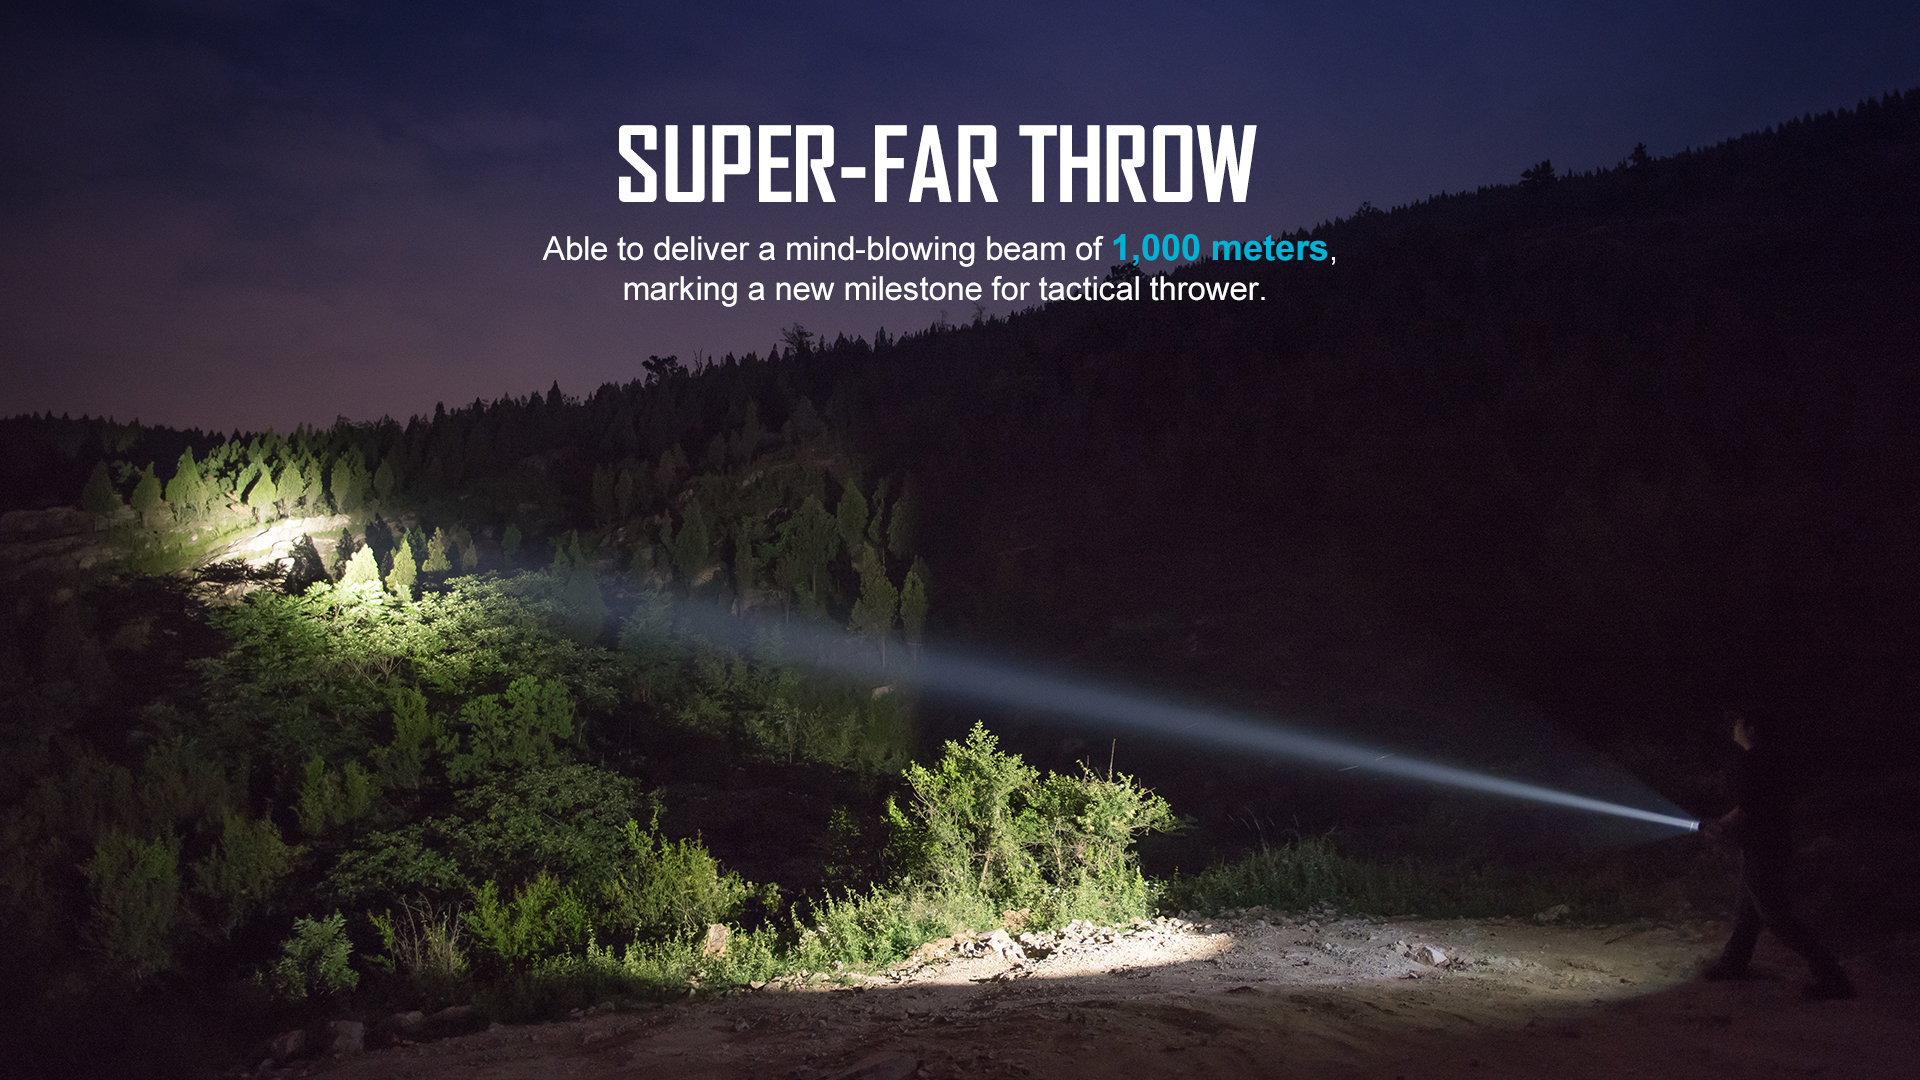 warrior x turbo tactical flashlight 1100 lumens